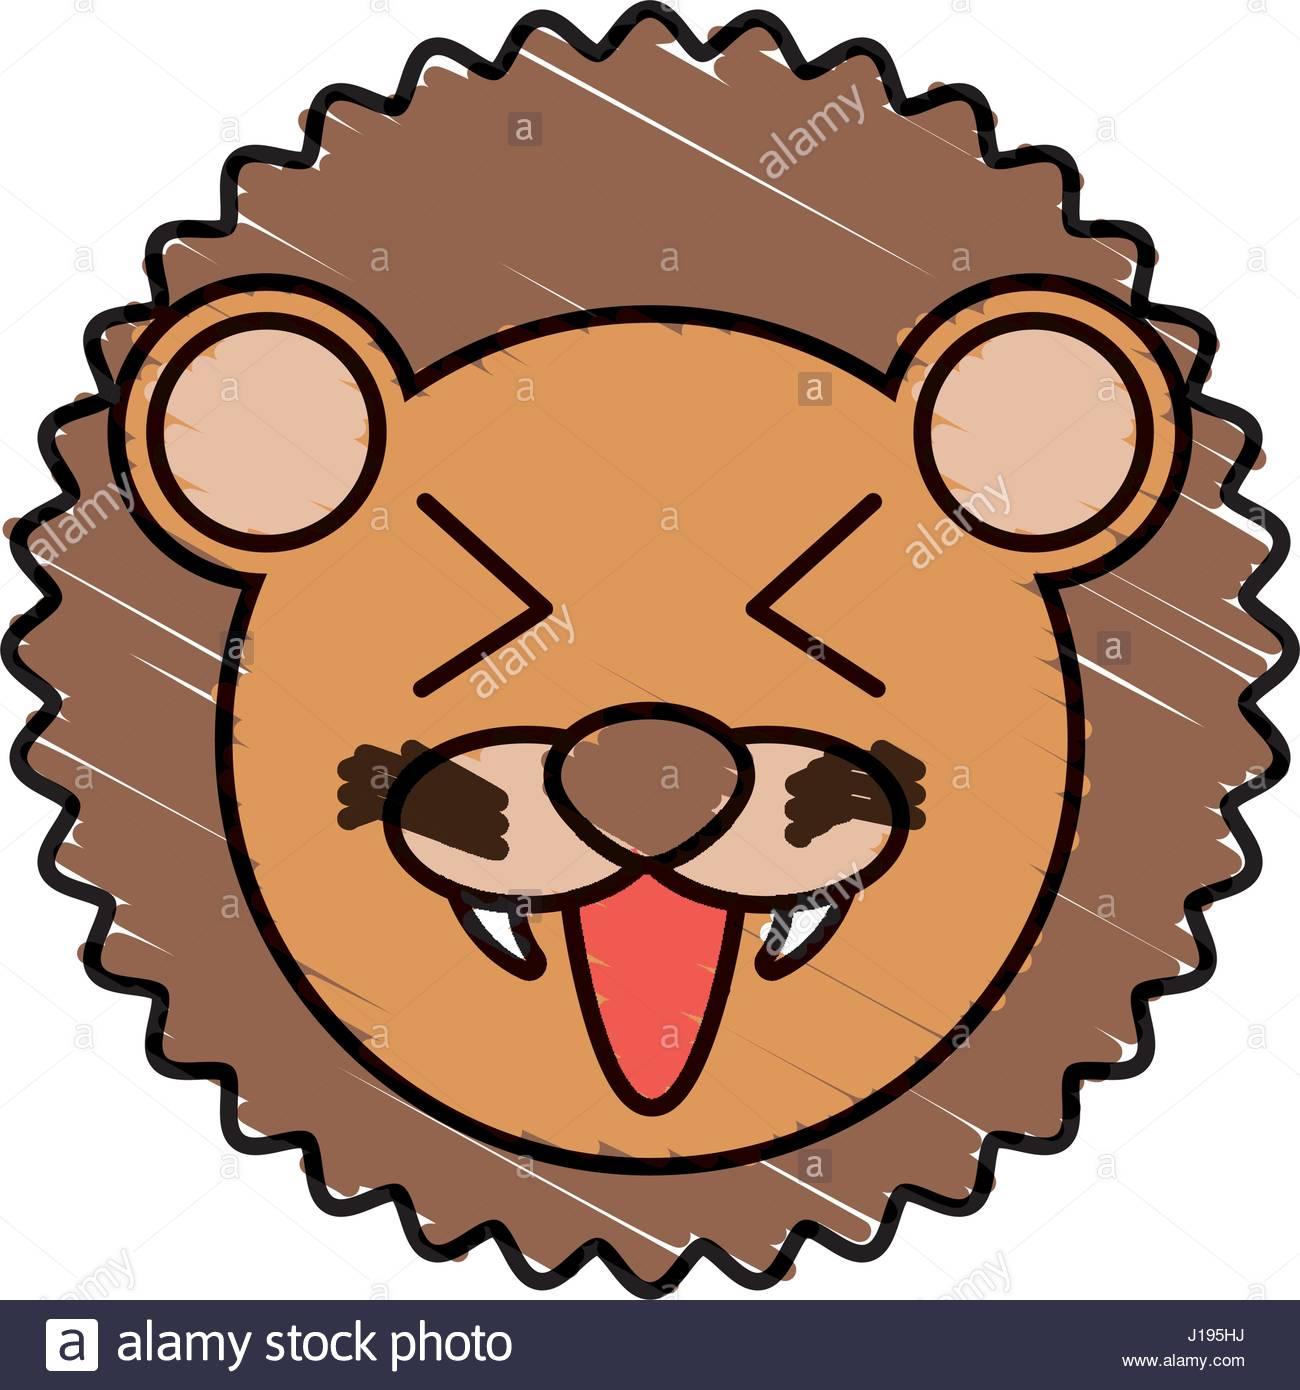 1300x1390 Cute Lion Drawing Animal Stock Vector Art Amp Illustration, Vector